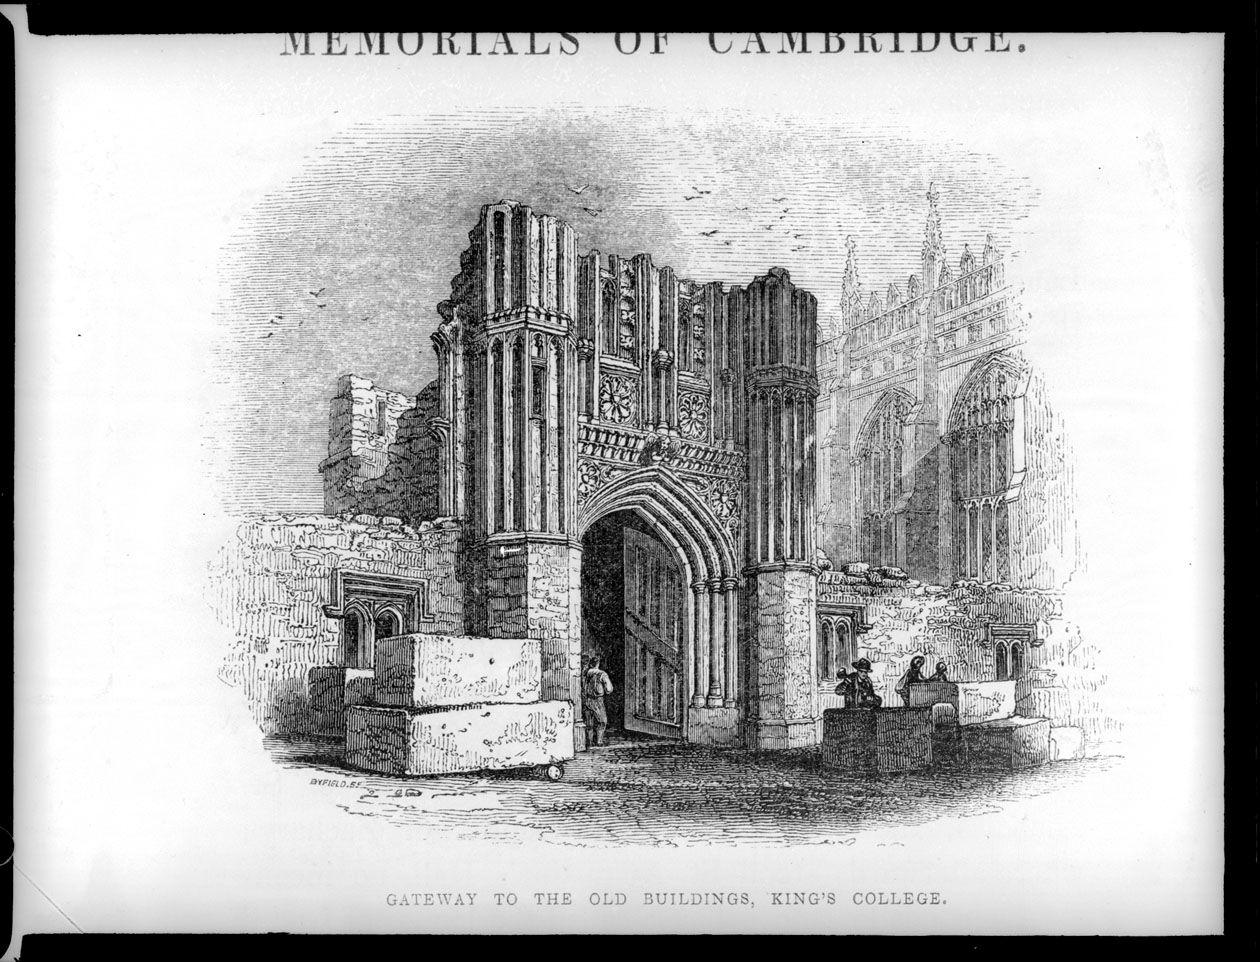 John Saltmarsh's lantern slide of Le Keux's engraving 'Gateway to the Old Buildings, King's College'. [JS/4/15/01]